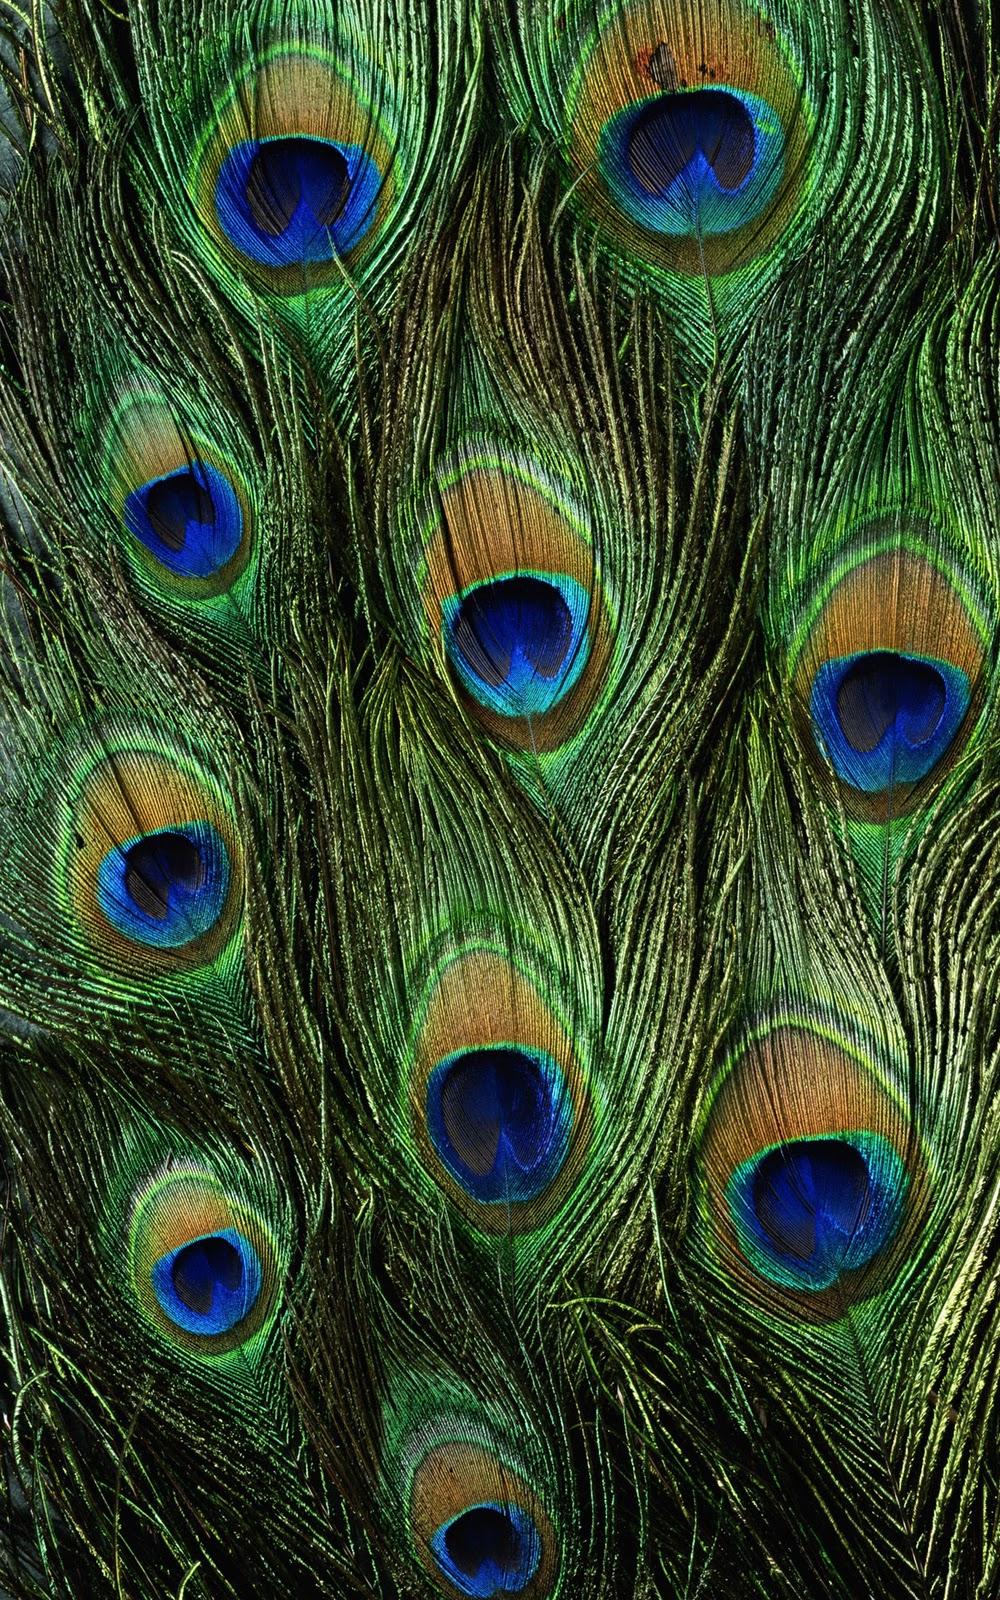 amazing peacock ipad background wallpapers free ipad